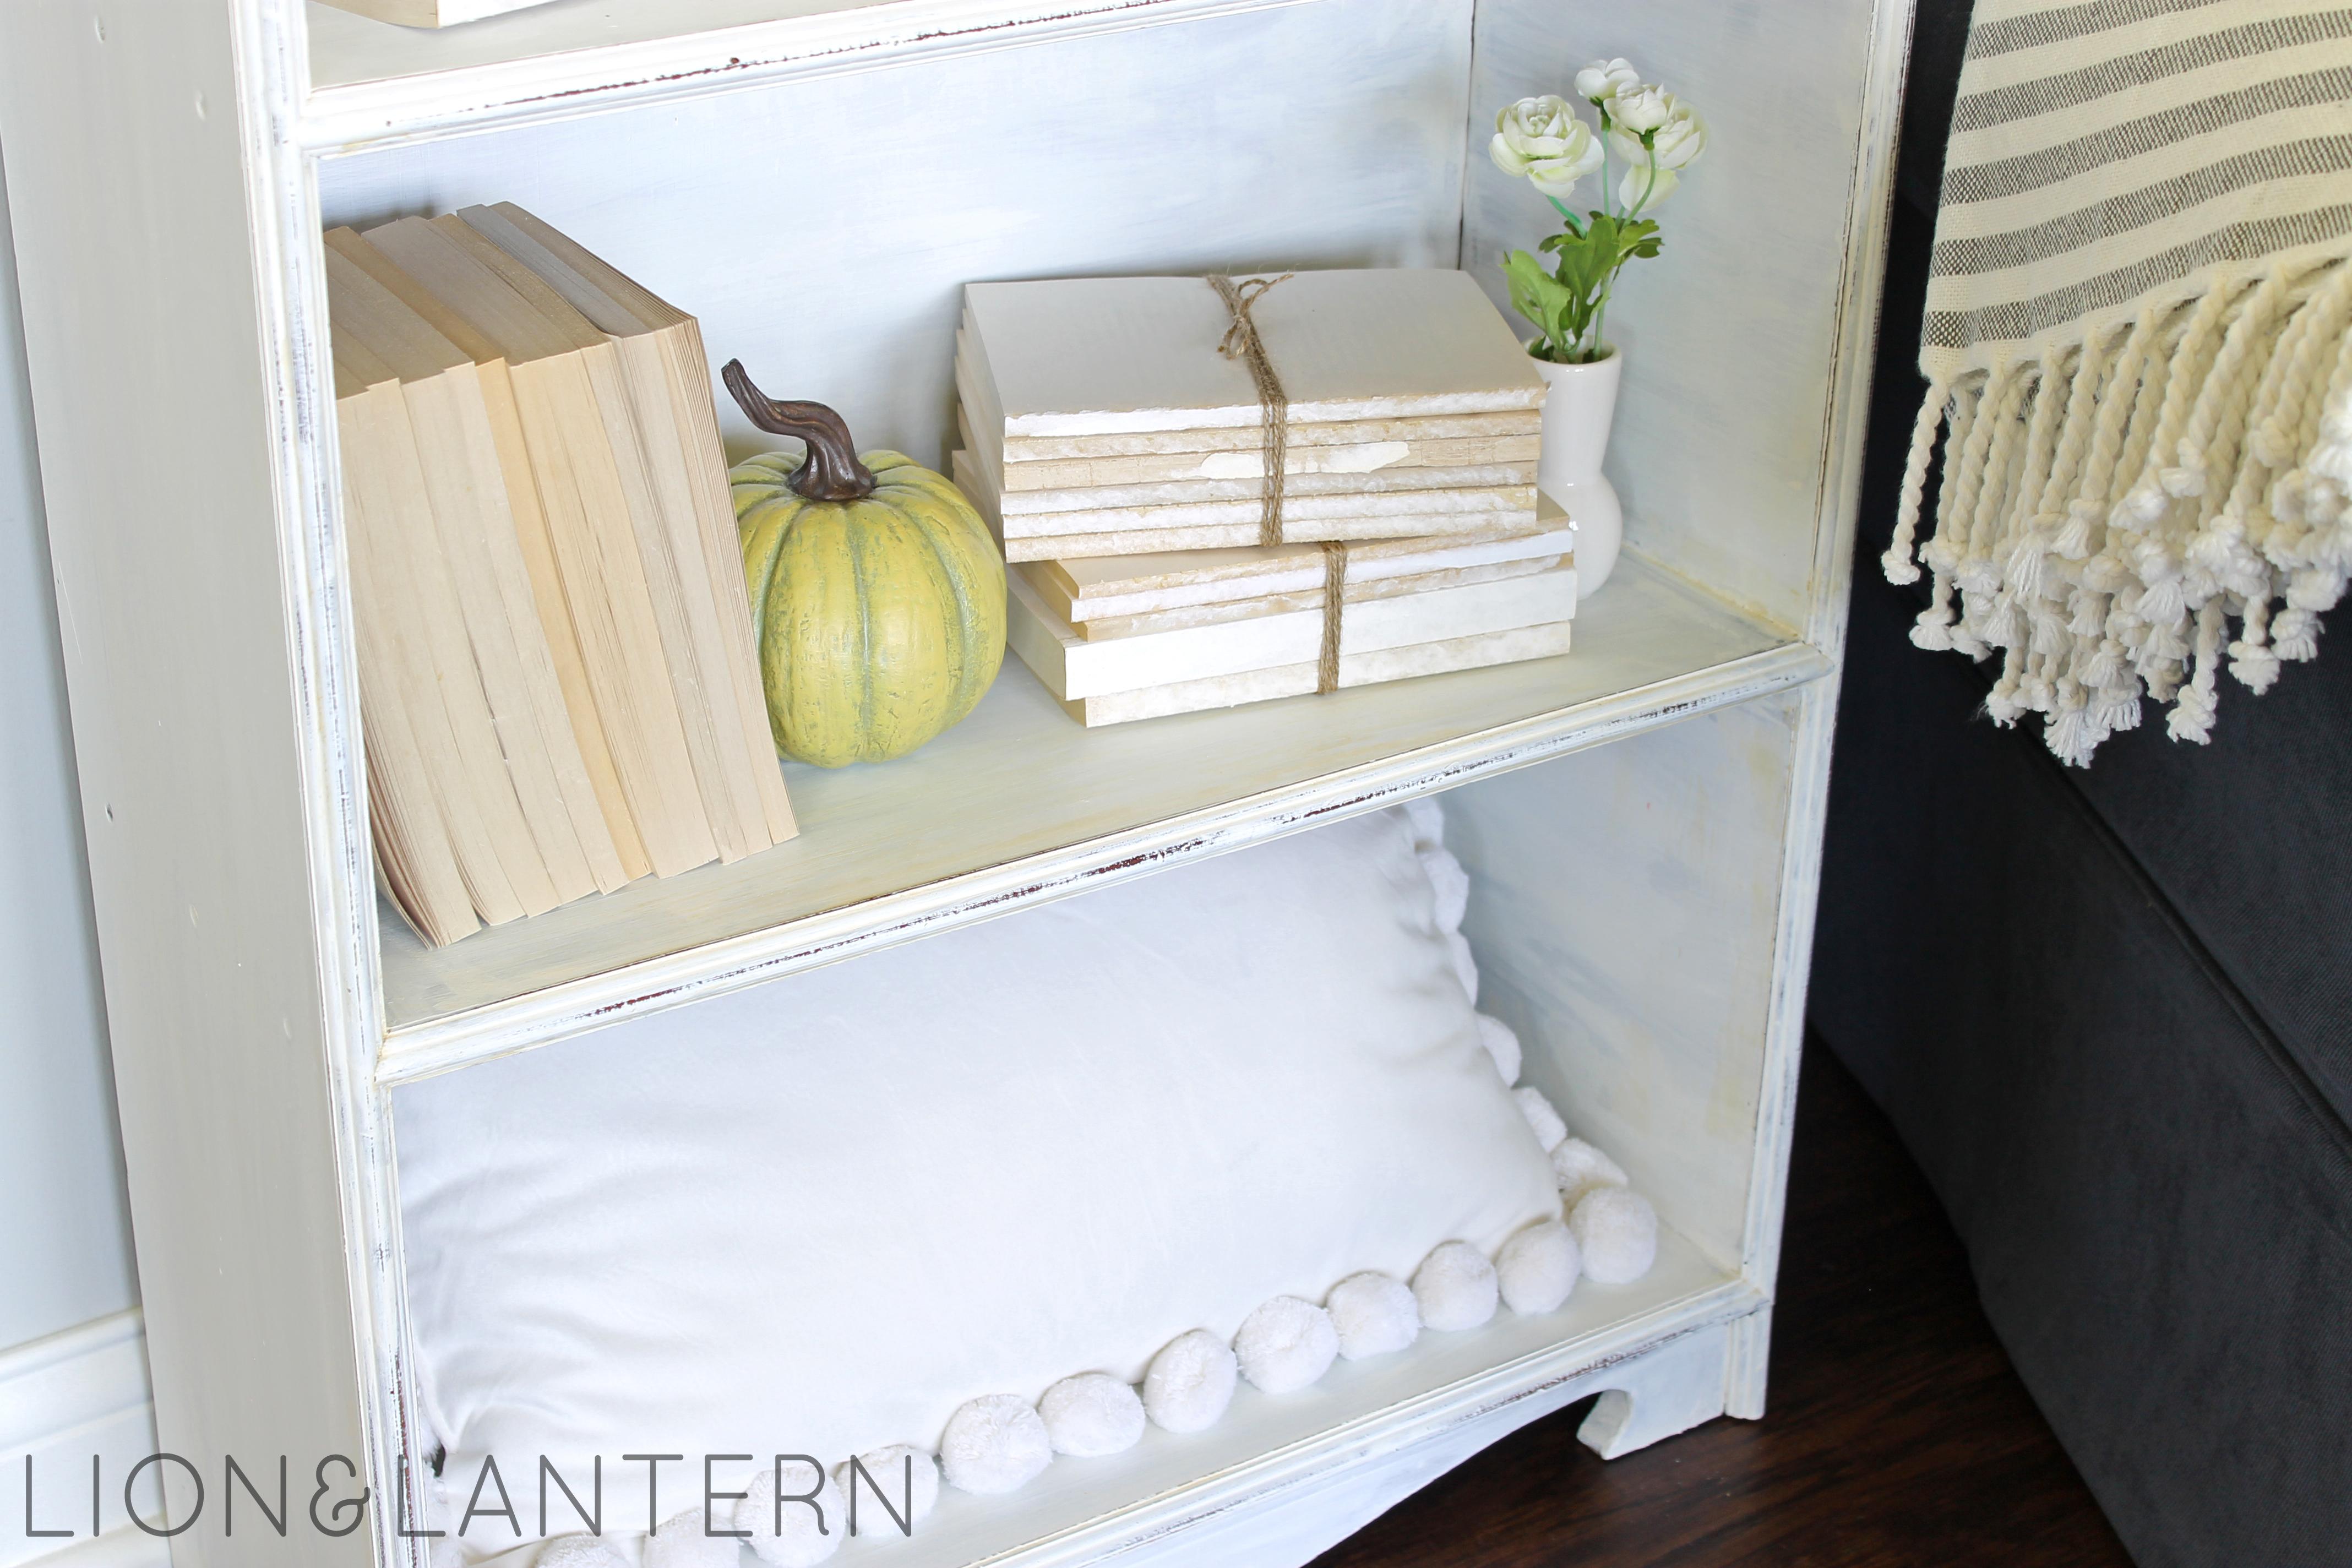 Cozy Autumn Bookcase Decor at LionAndLantern.com. Book bundle, neutral pumpkin, pom pom pillow.